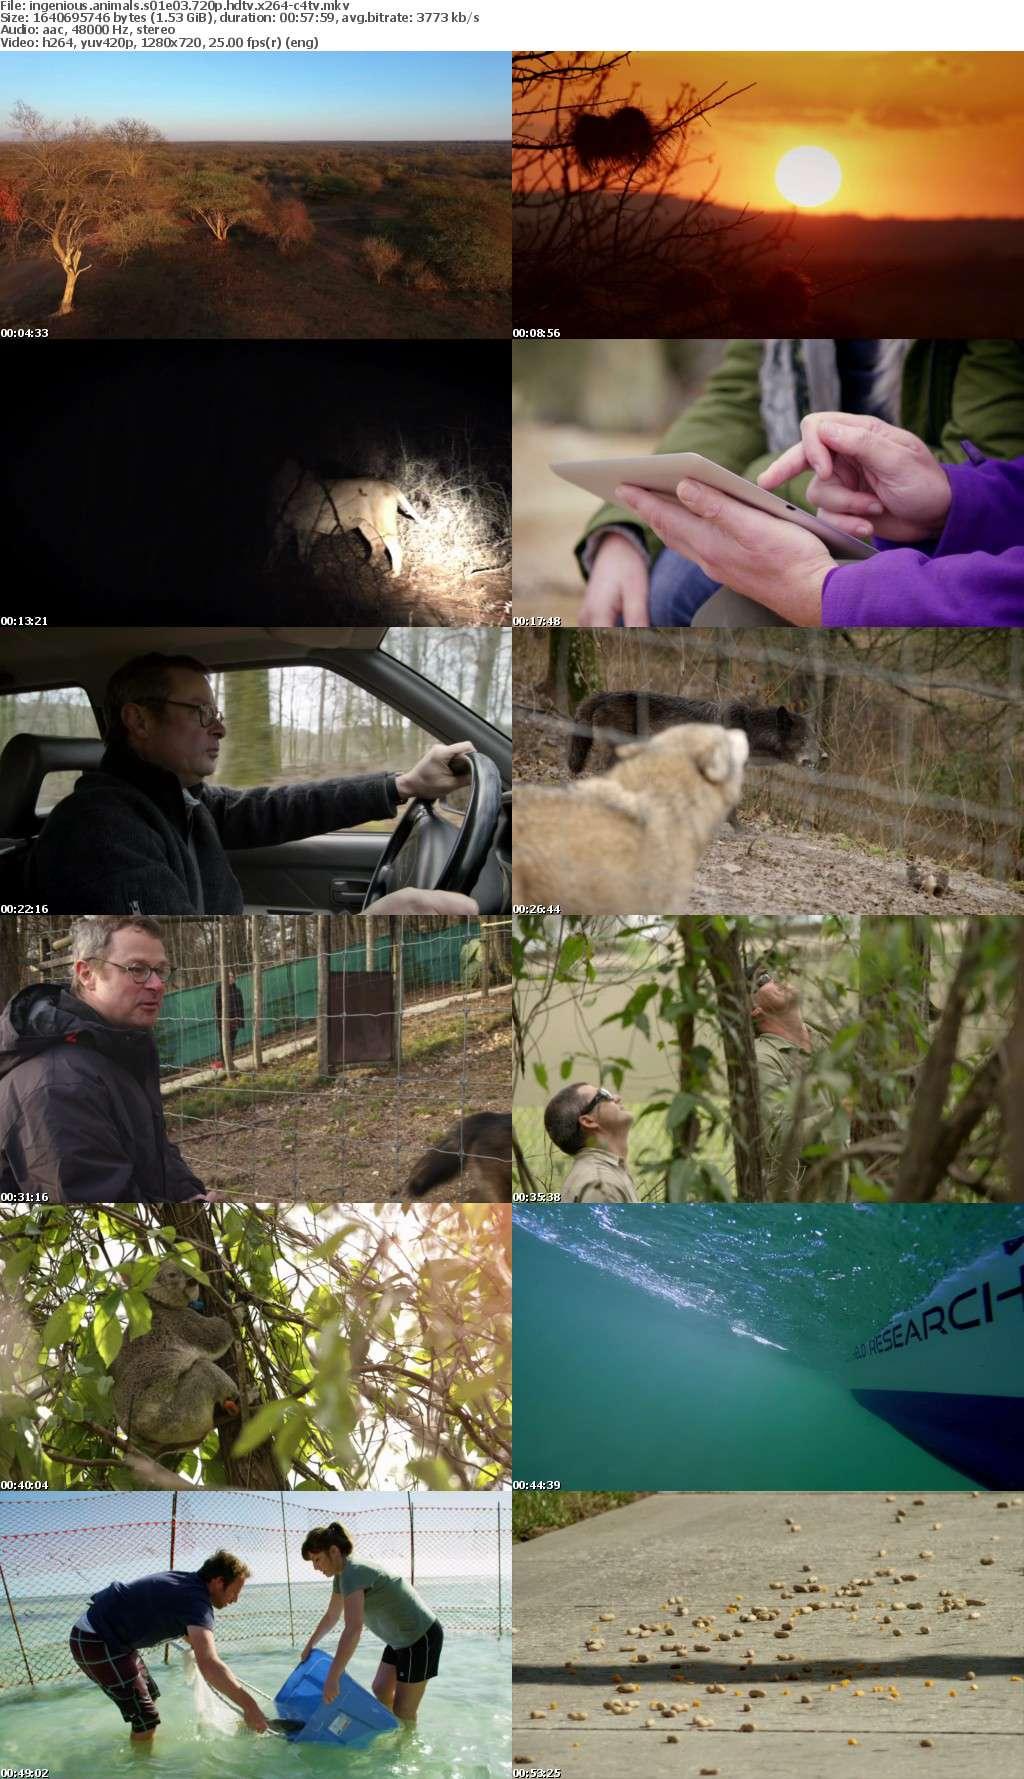 Ingenious Animals S01E03 720p HDTV x264-C4TV